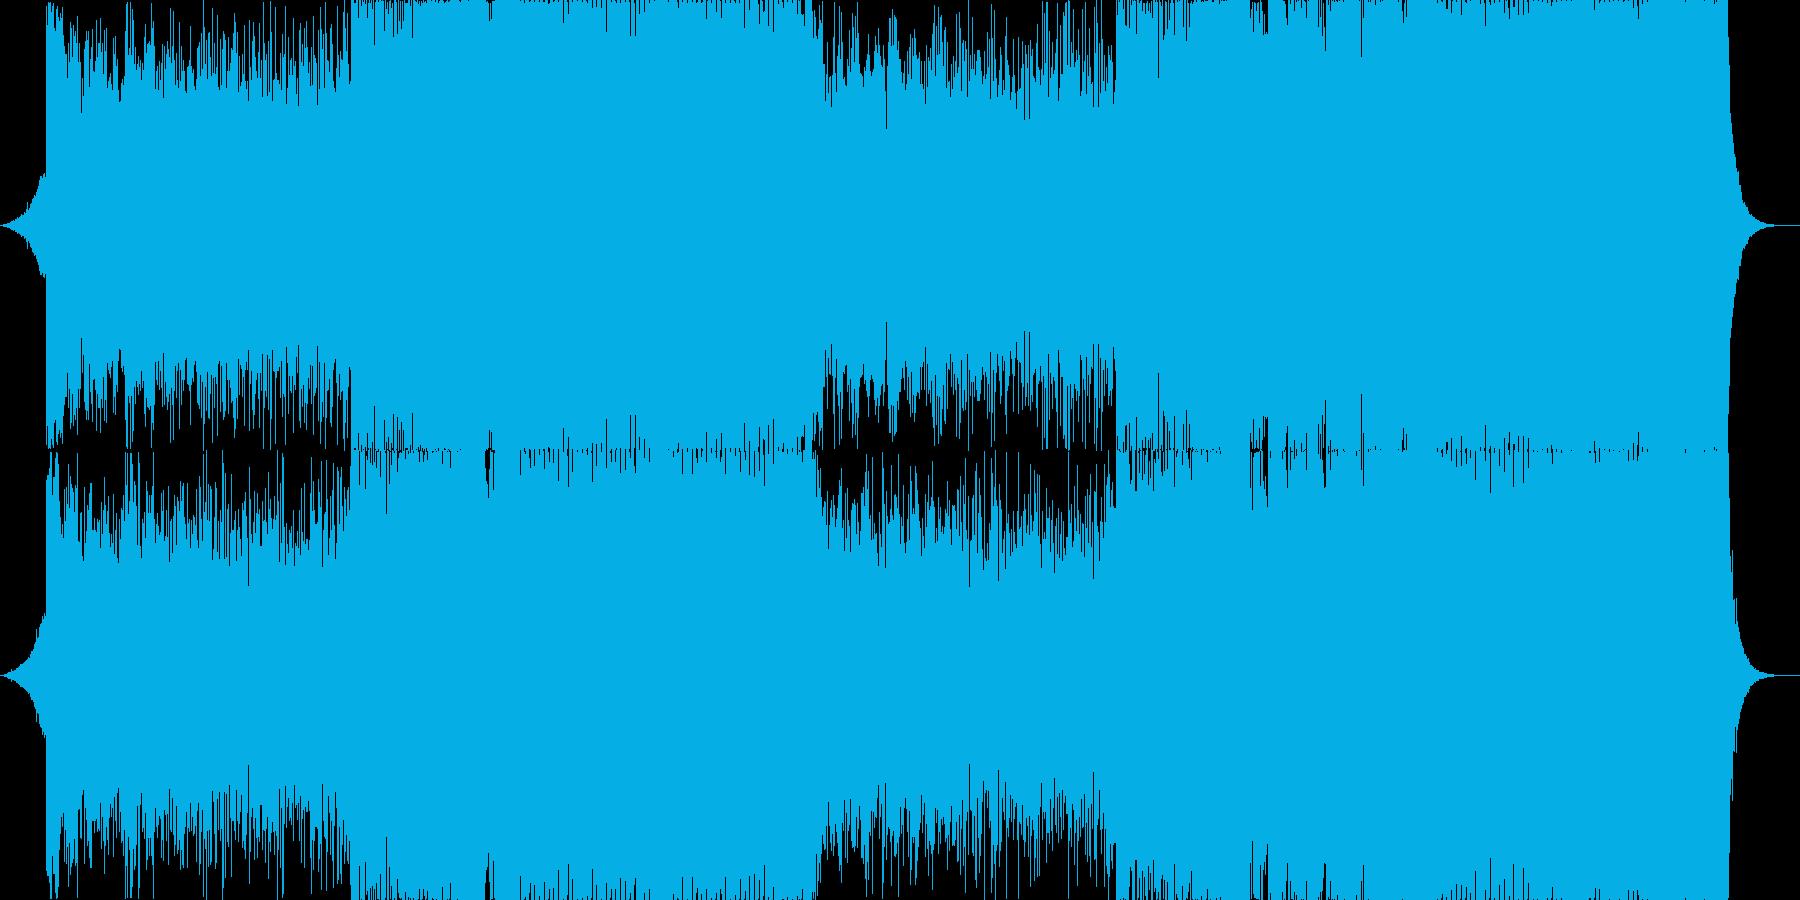 Western music K-Pop Cool house EDM's reproduced waveform